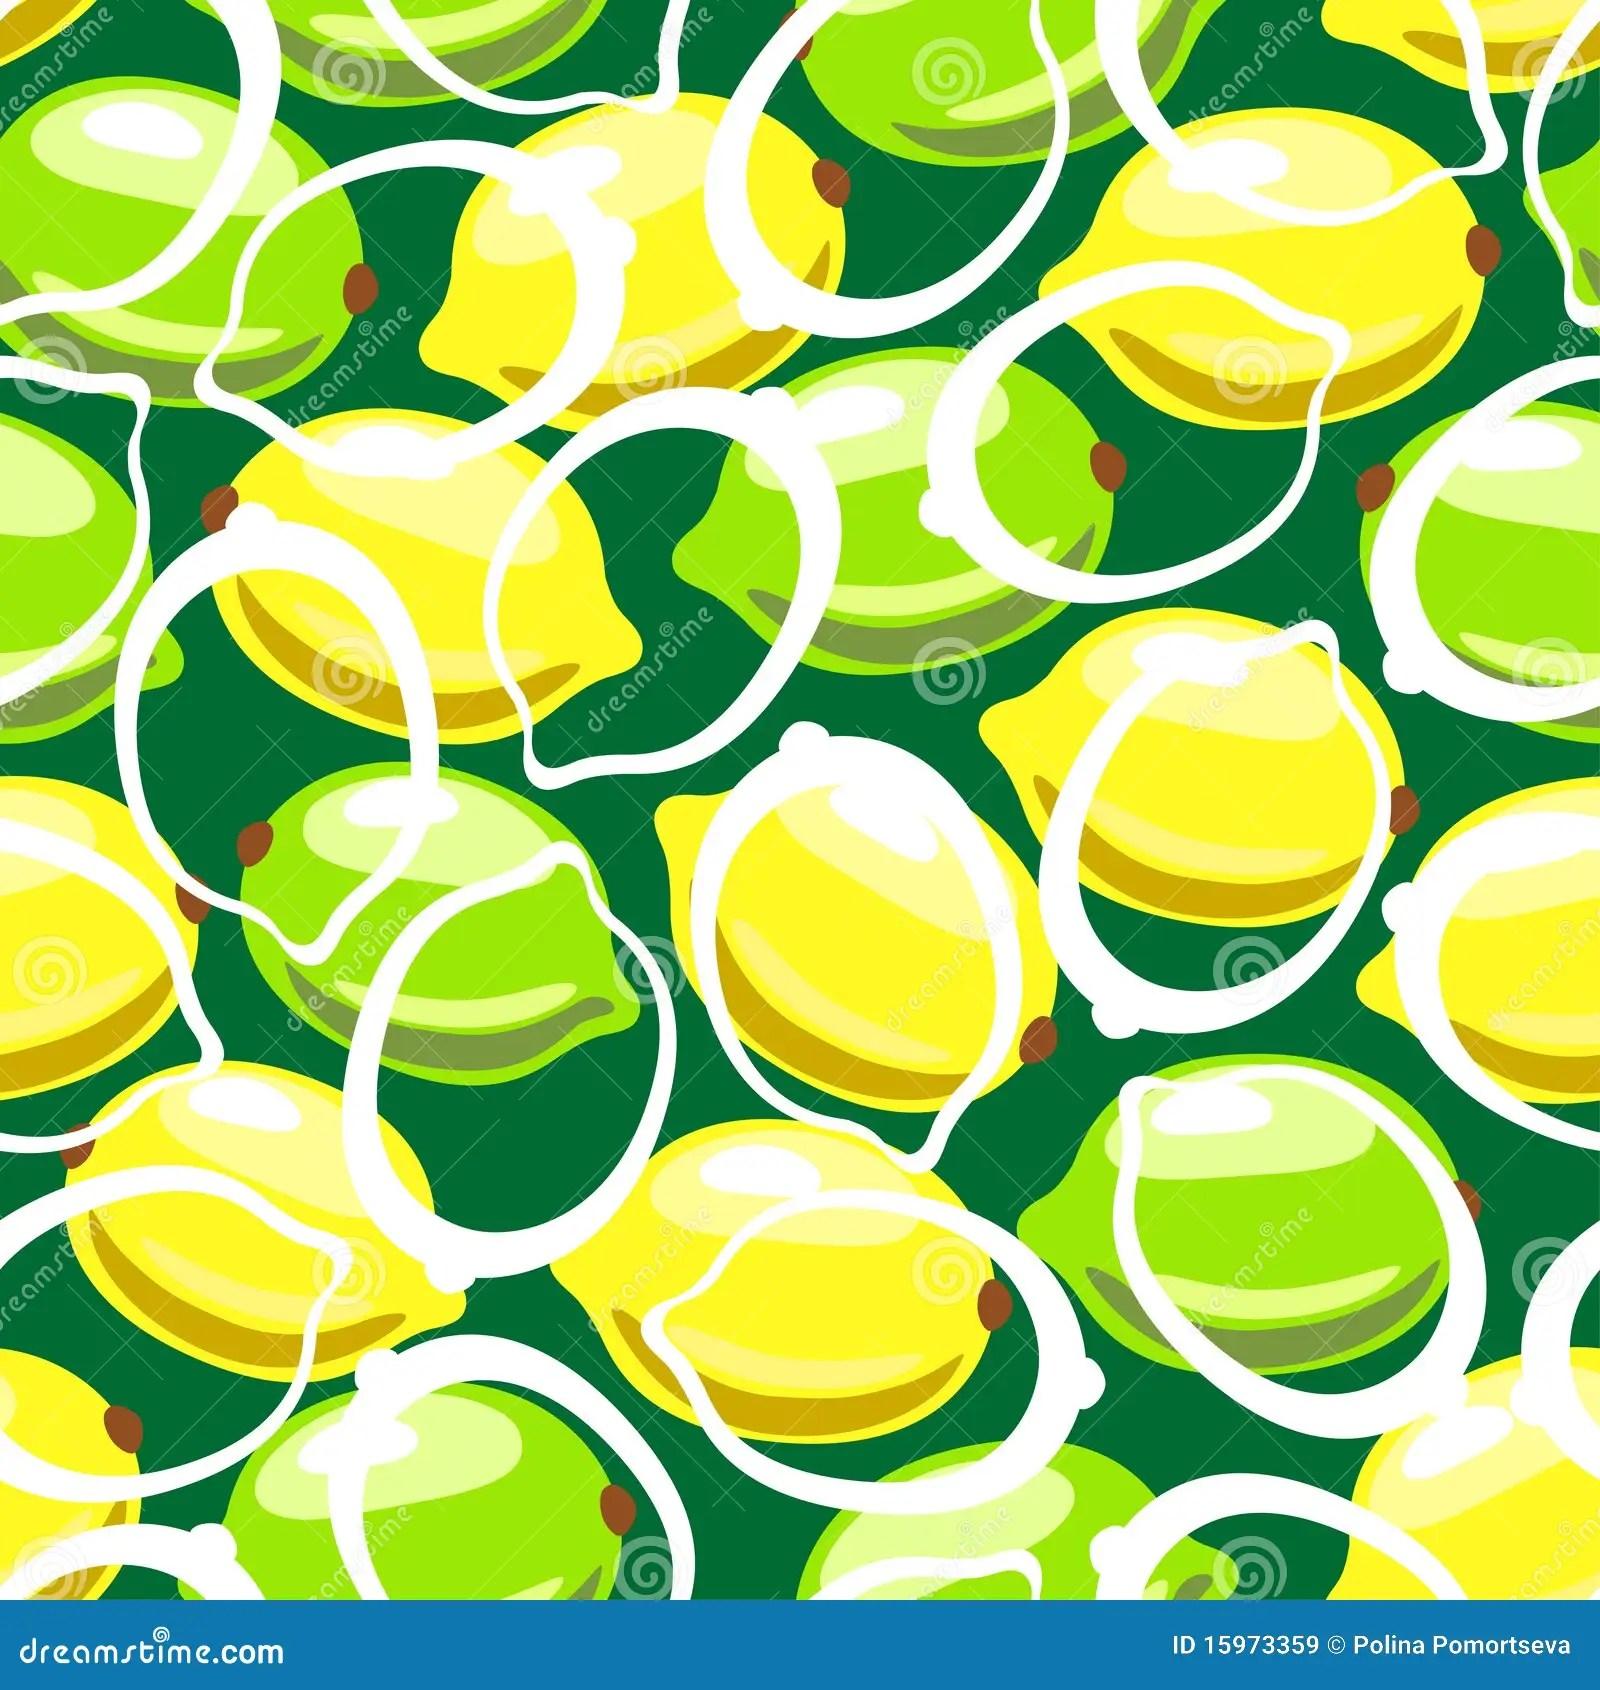 Cute Pattern Wallpaper Free Lemon Seamless Pattern Royalty Free Stock Images Image